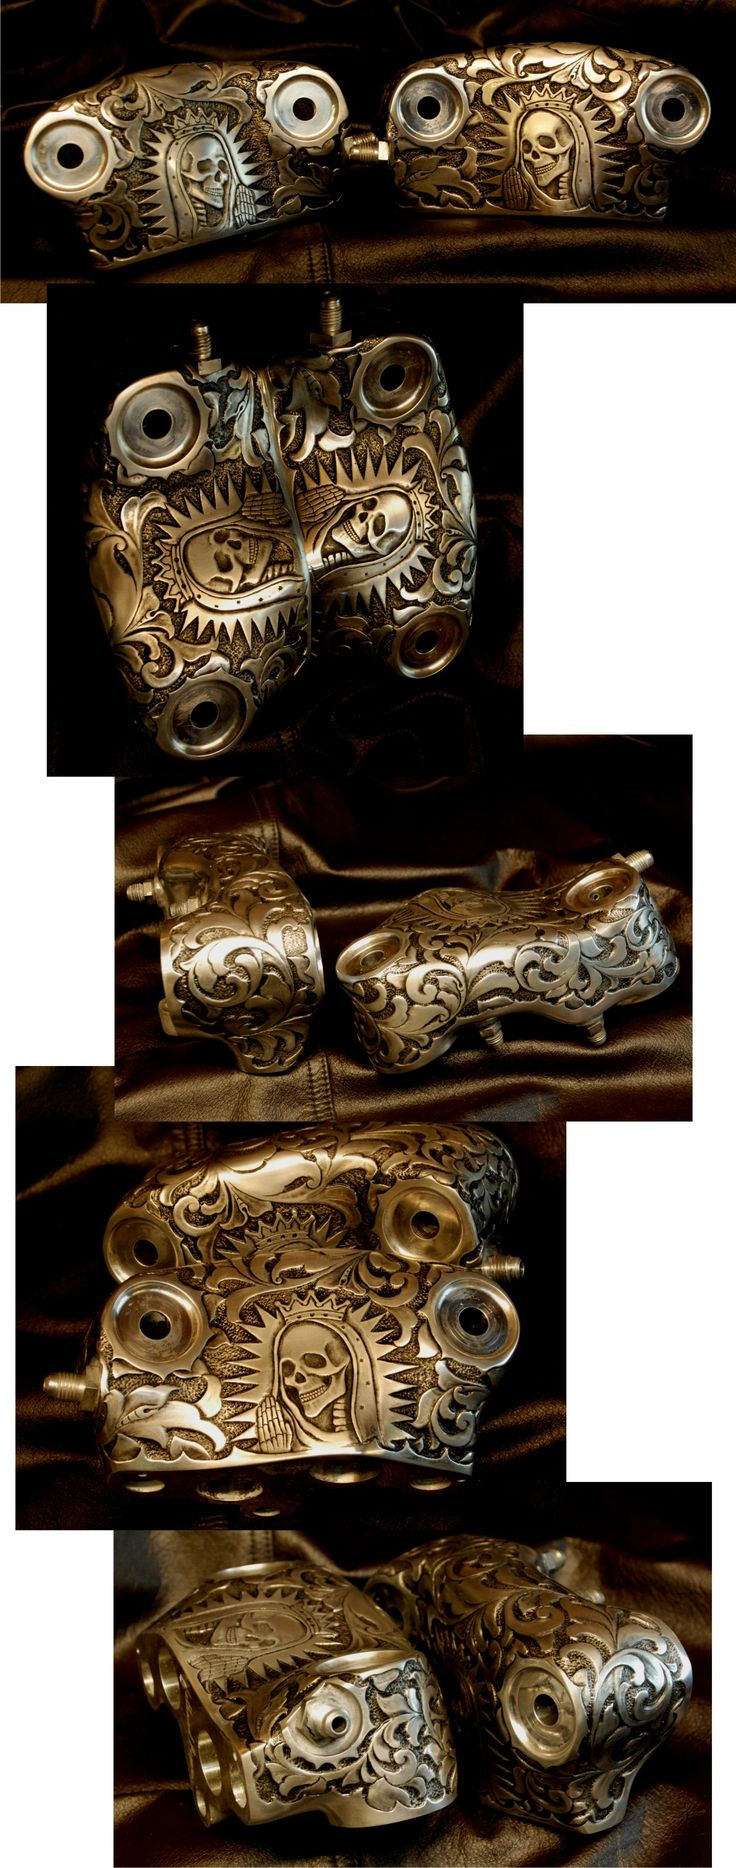 Otto Carter engraving - Godspeed Knucklehead Motor Parts